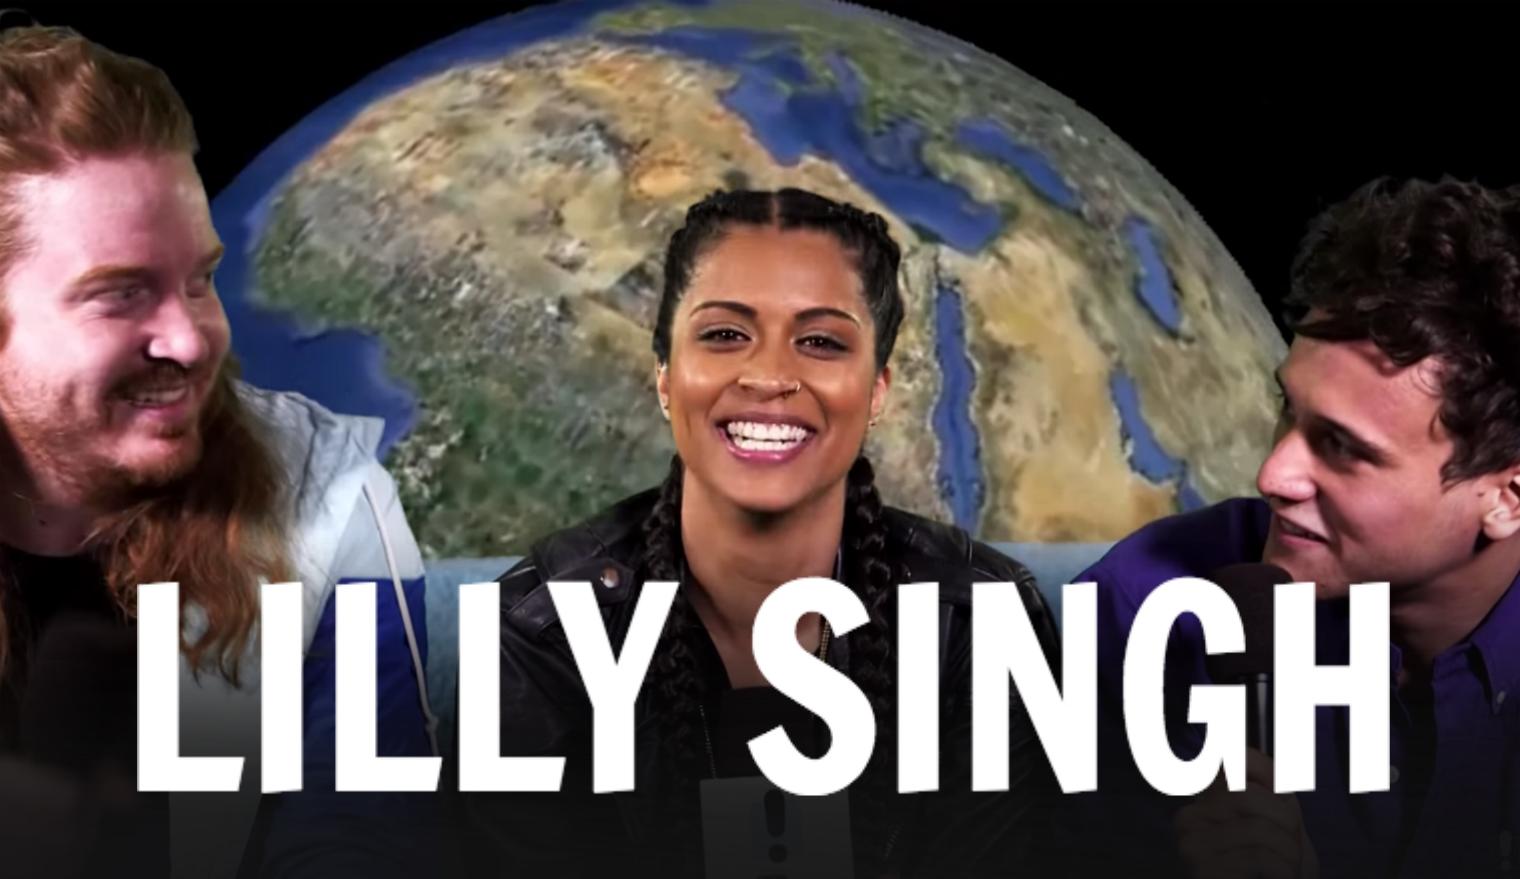 LILLY SINGH CORRECT WEBPIC.jpg